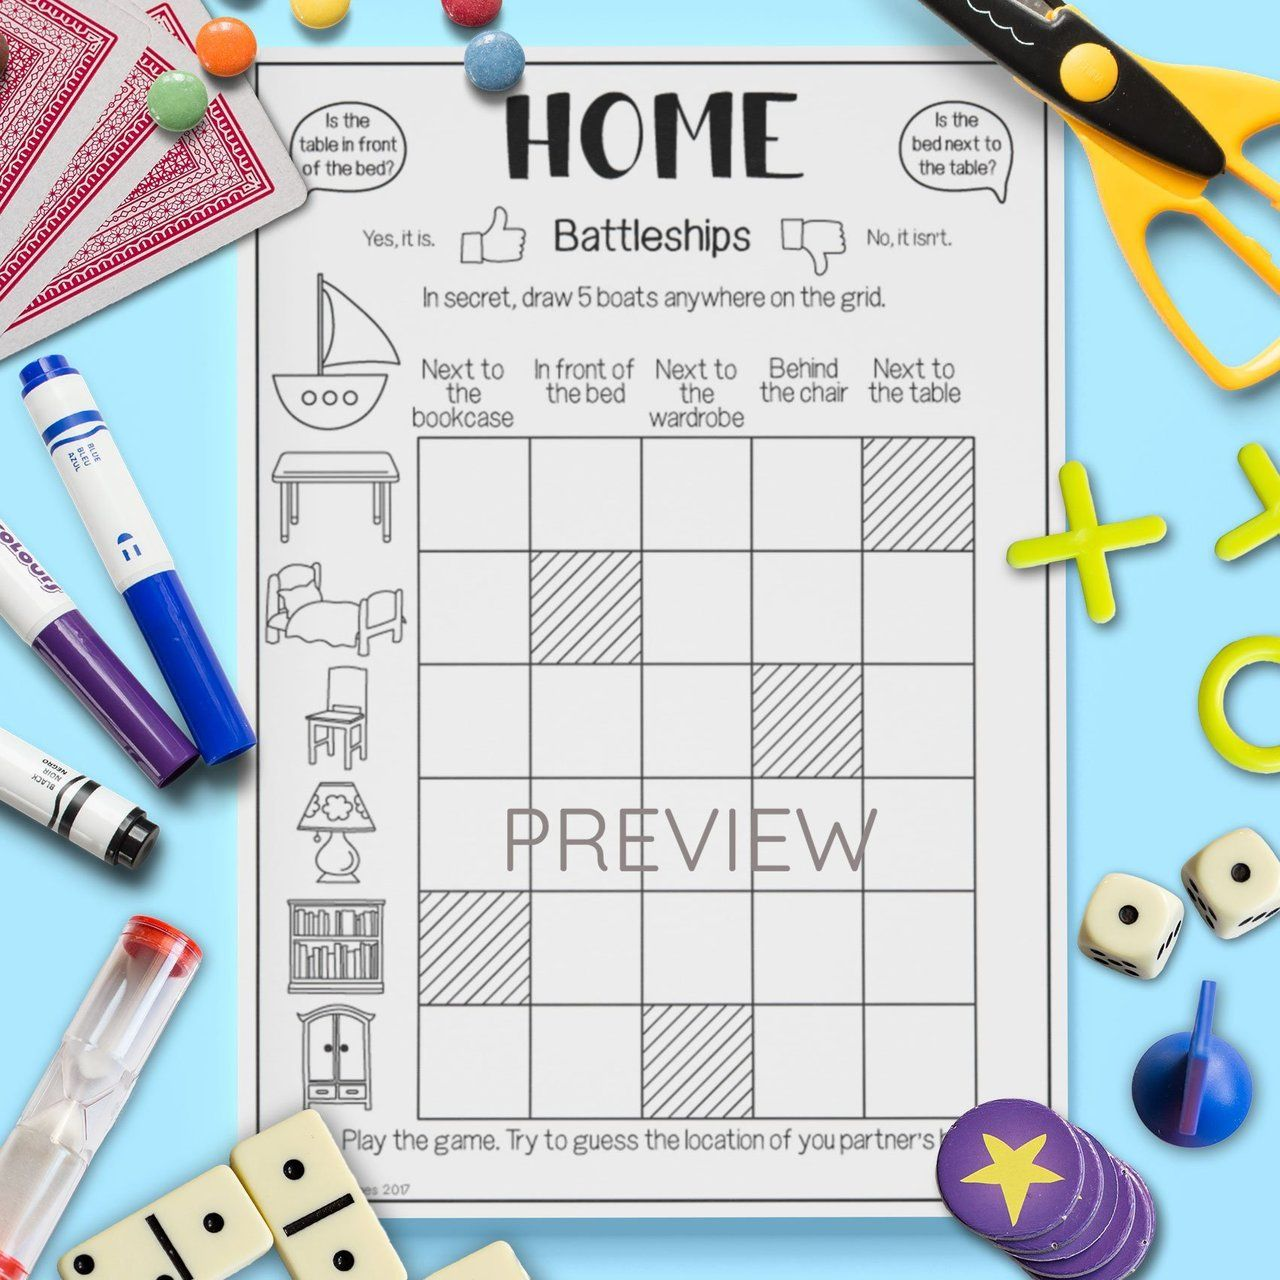 Home 'Battleships' Game Освіта, Граматика